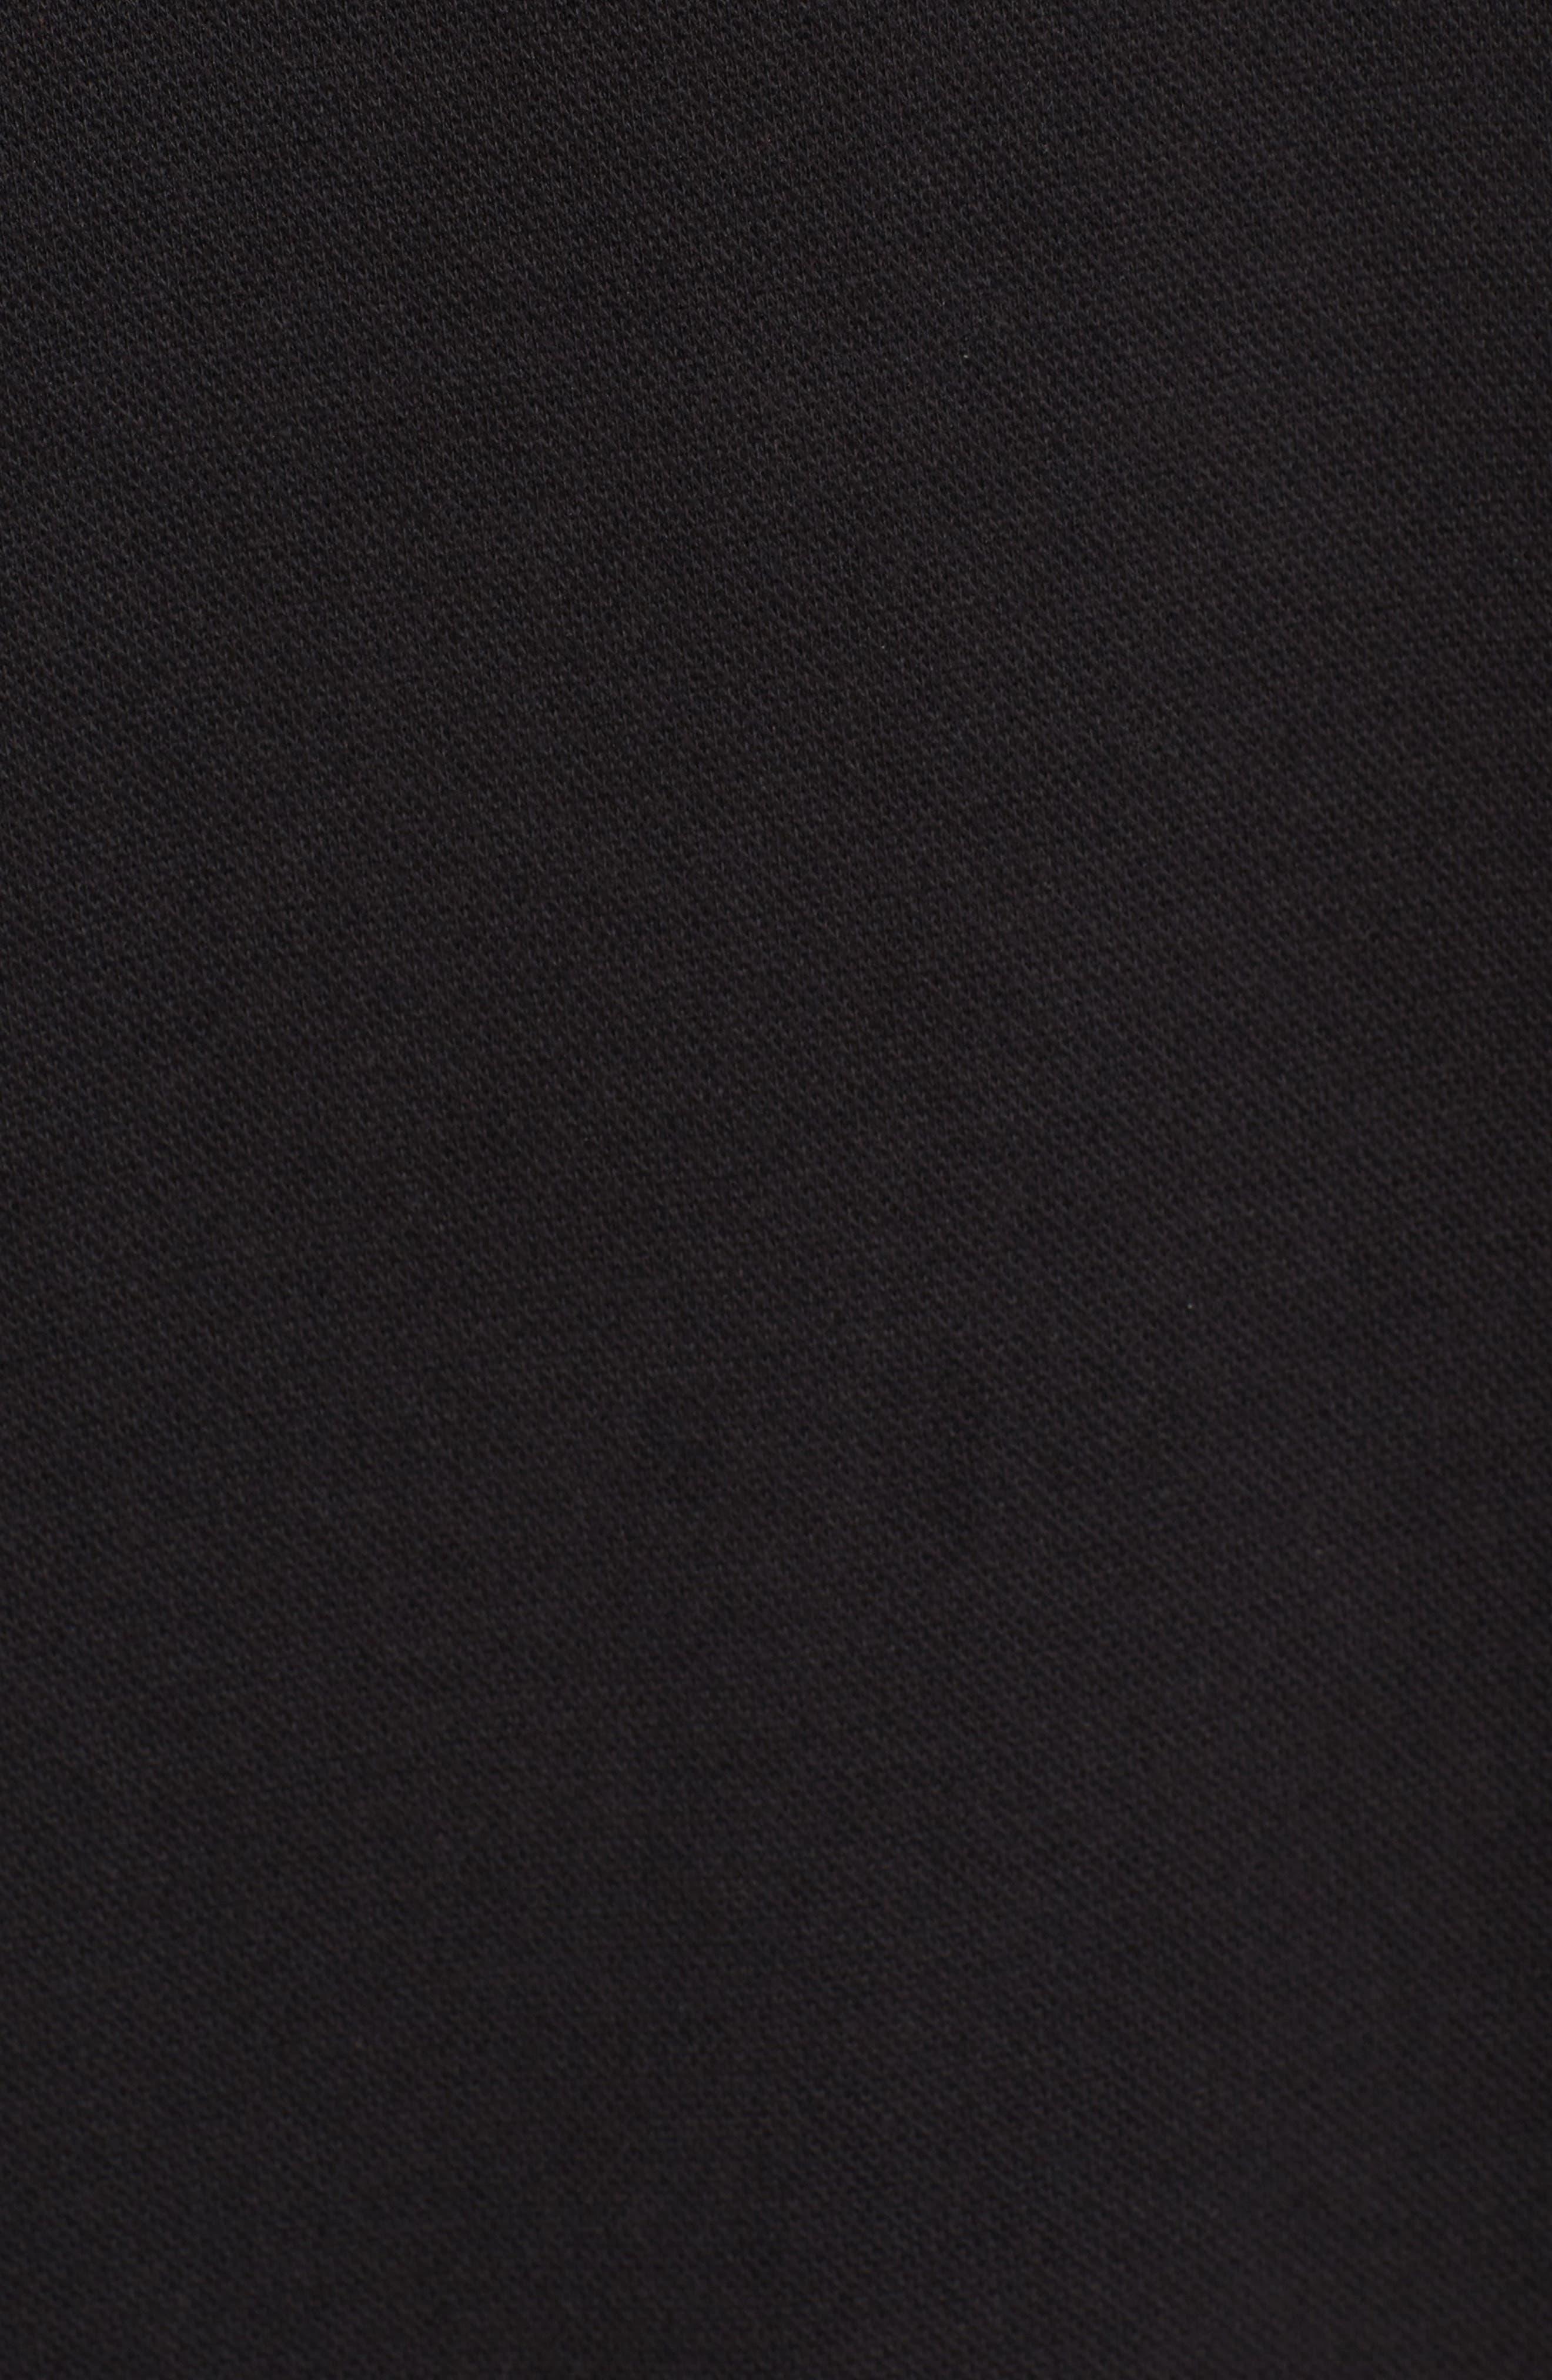 Hoodie Dress,                             Alternate thumbnail 5, color,                             Black